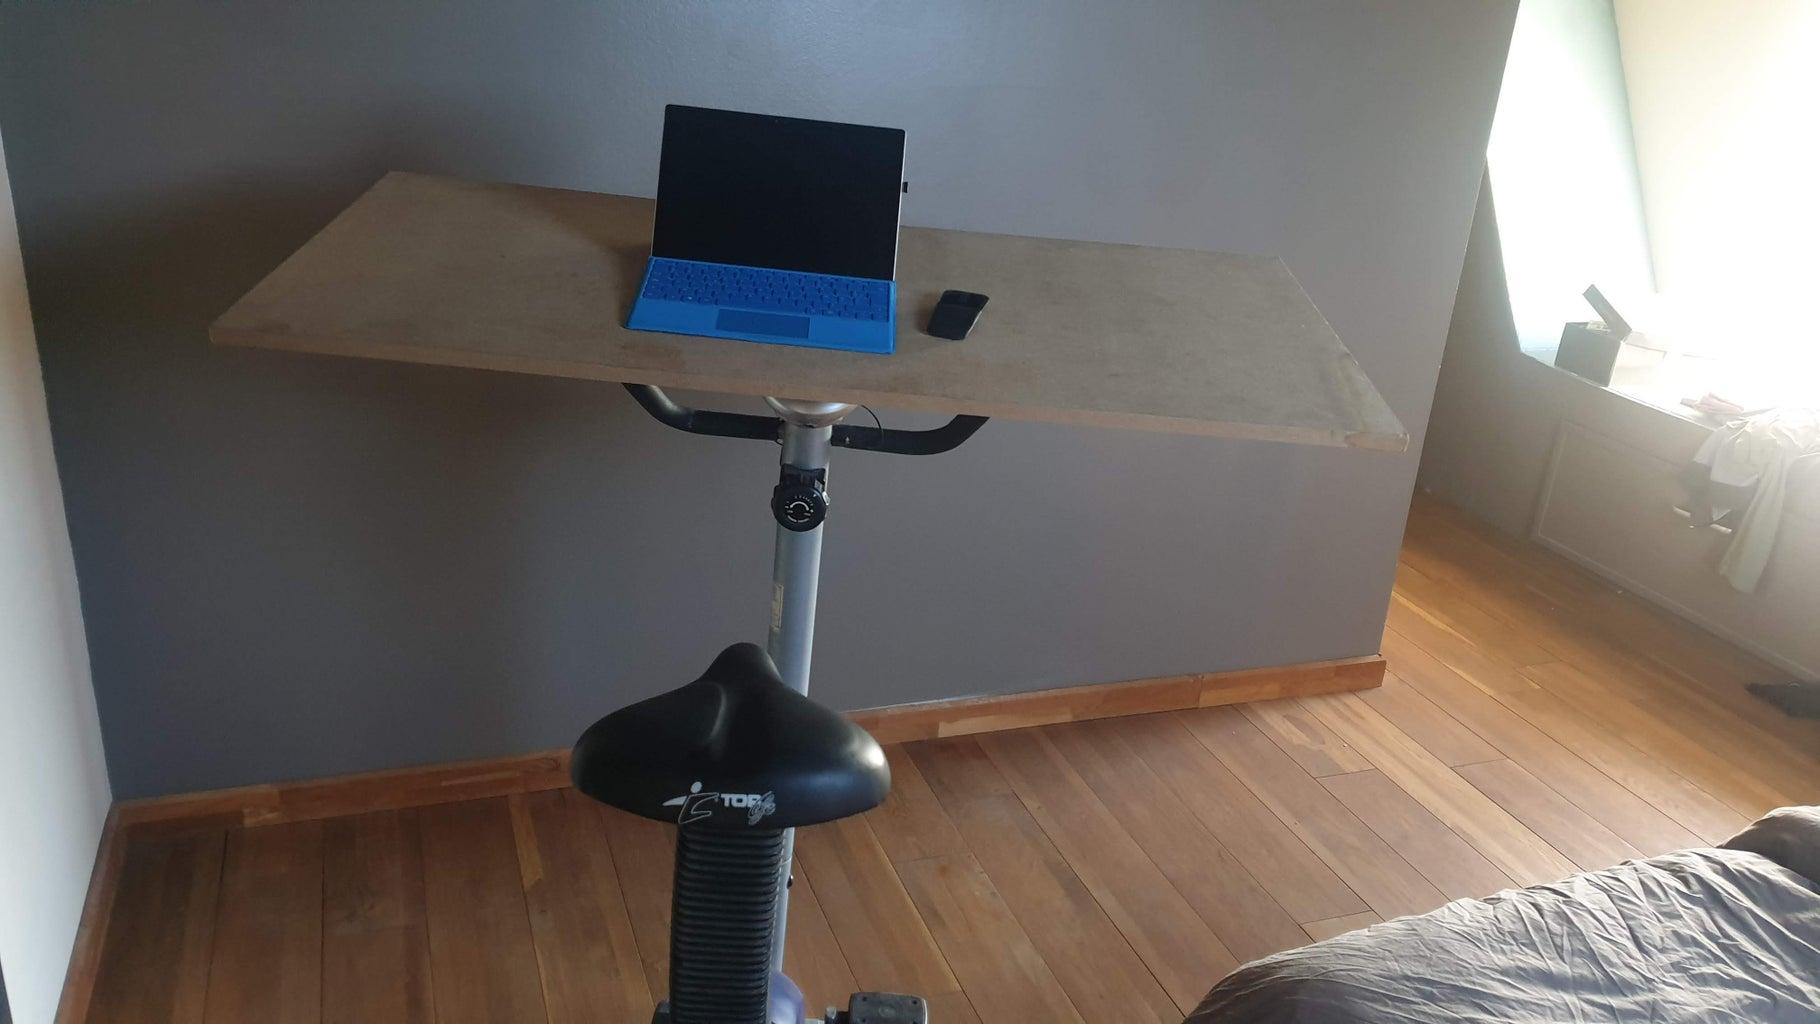 Cycle While Homeworking